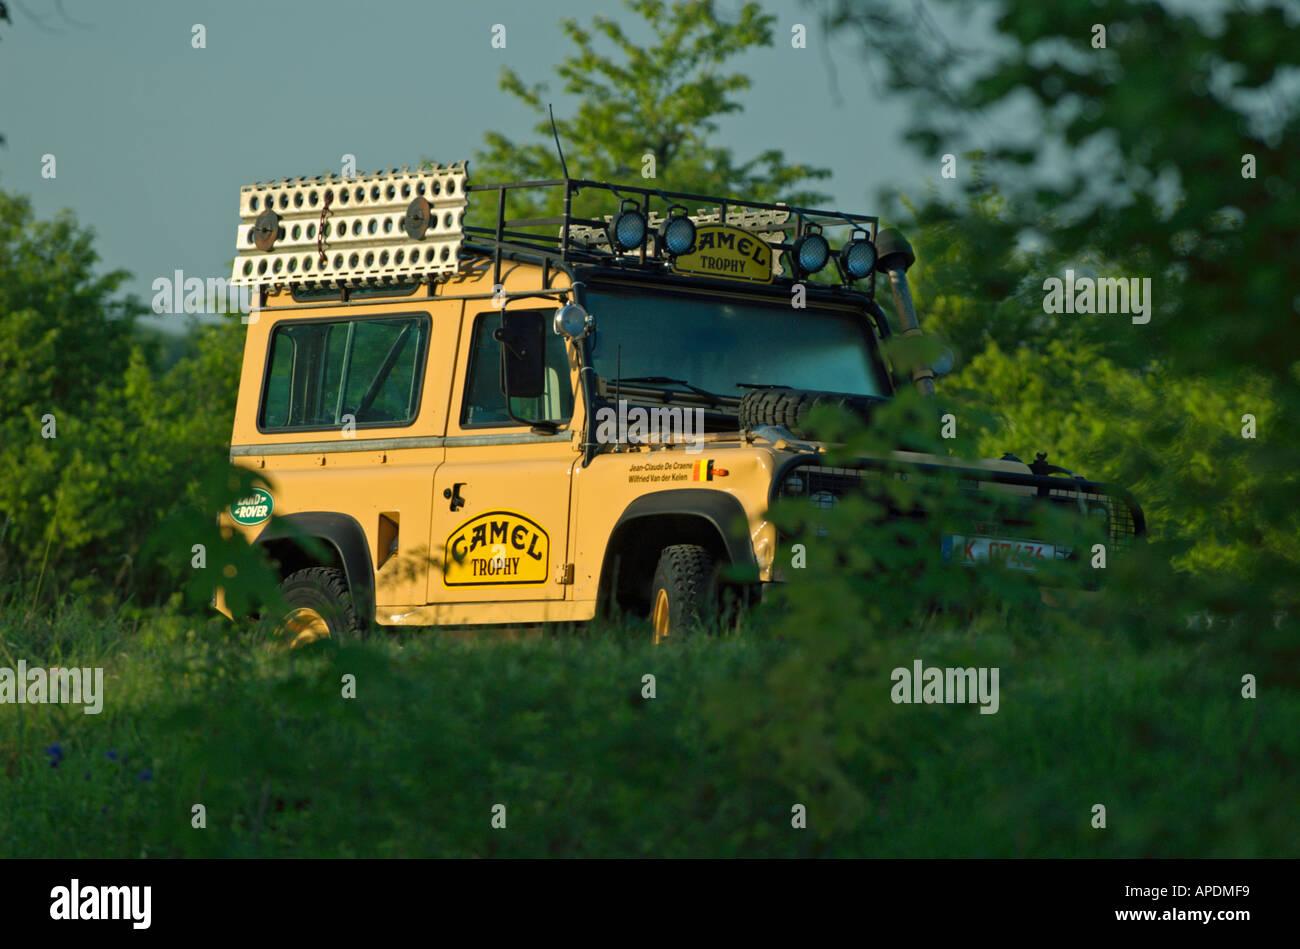 Original 1985 Camel Trophy Land Rover Defender 90 Stock Photo, Royalty Free Image: 5144824 - Alamy